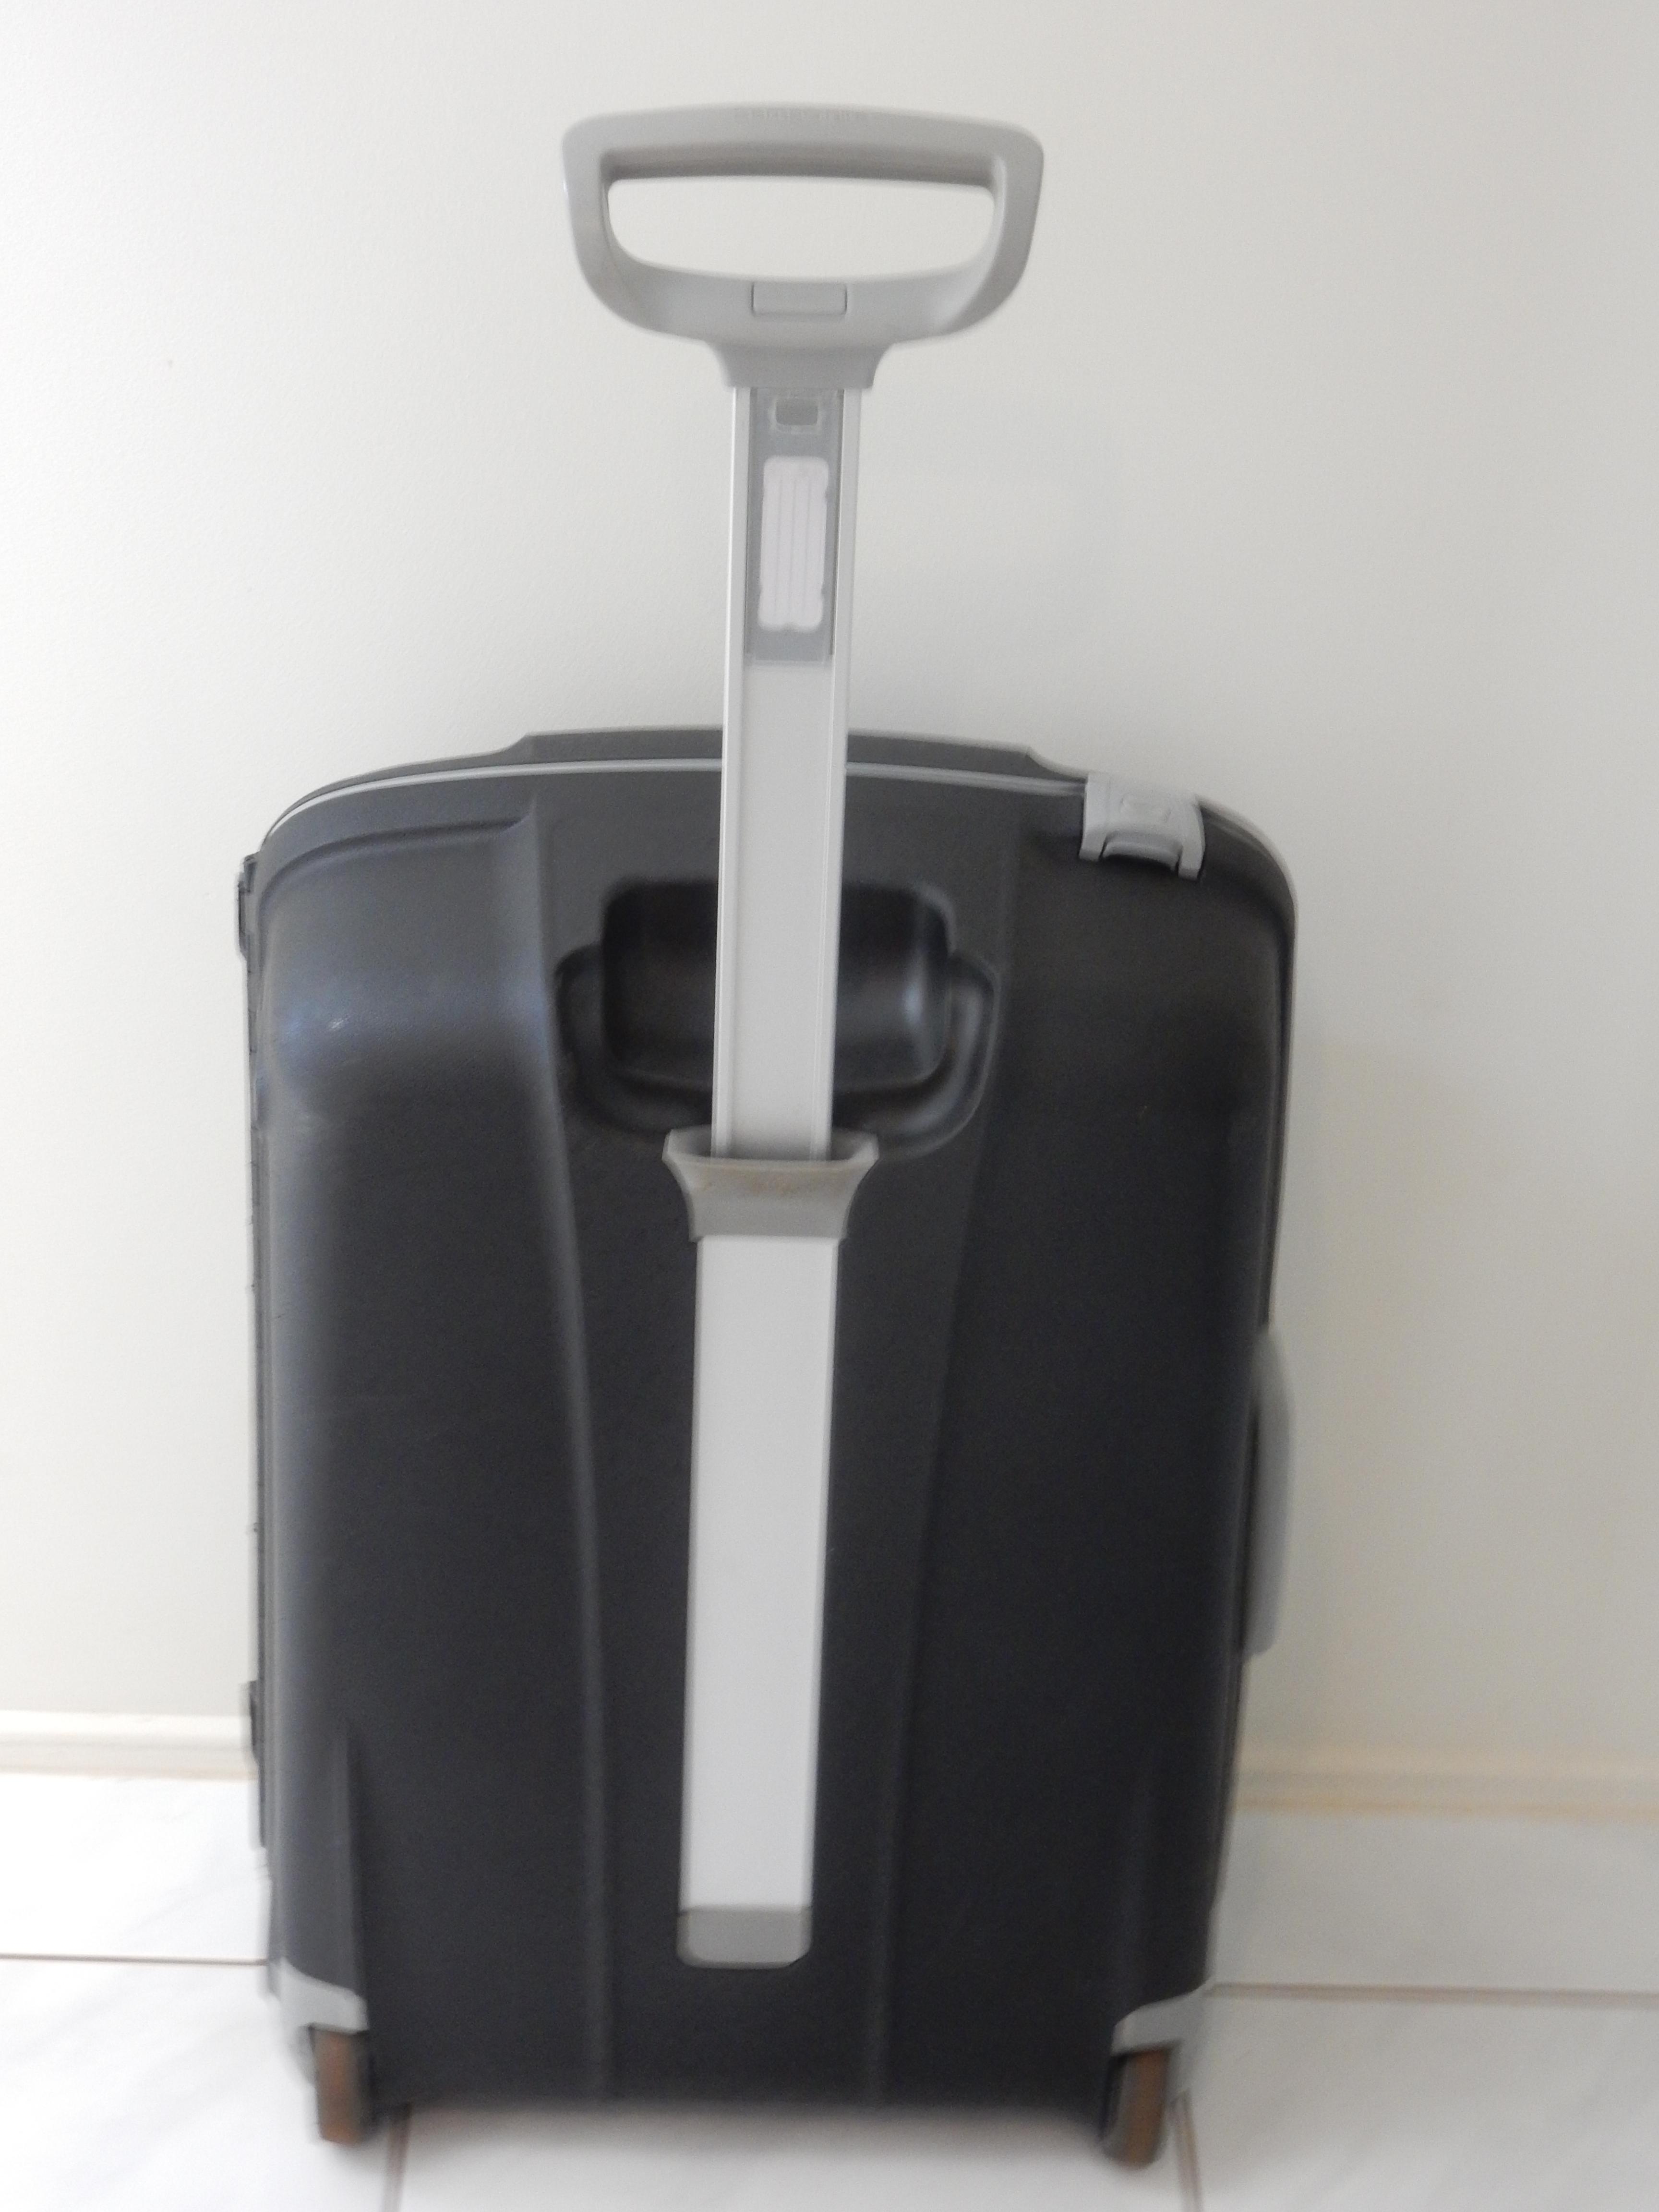 samsonite travel bag hard cover 2 wheeler grey black  87.5 litre number coded built in lock  8 years  global warranty